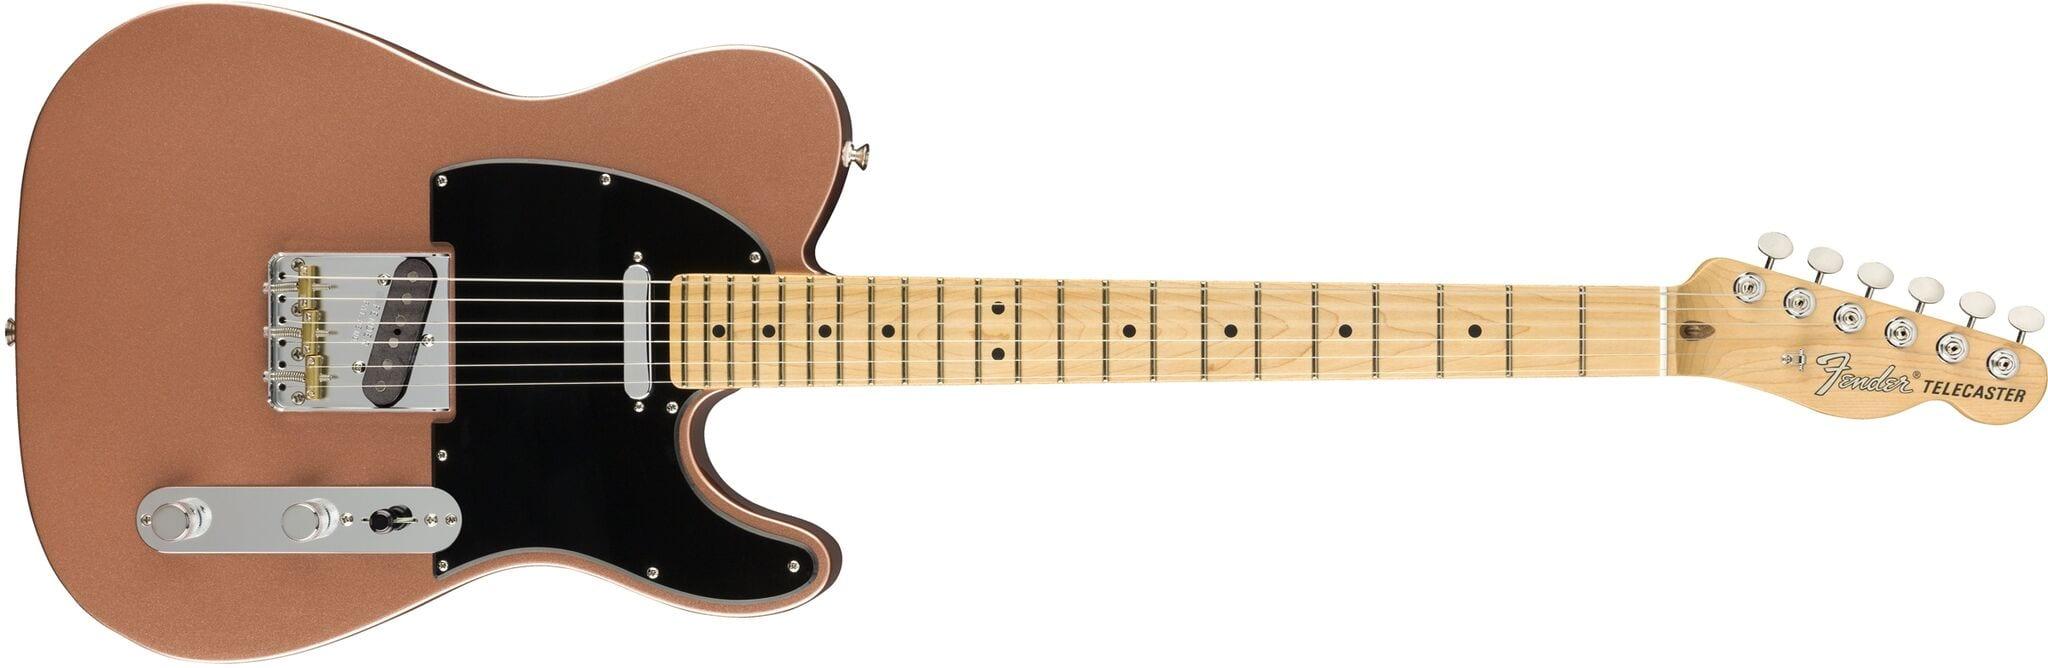 Fender American Performer Series Telecaster